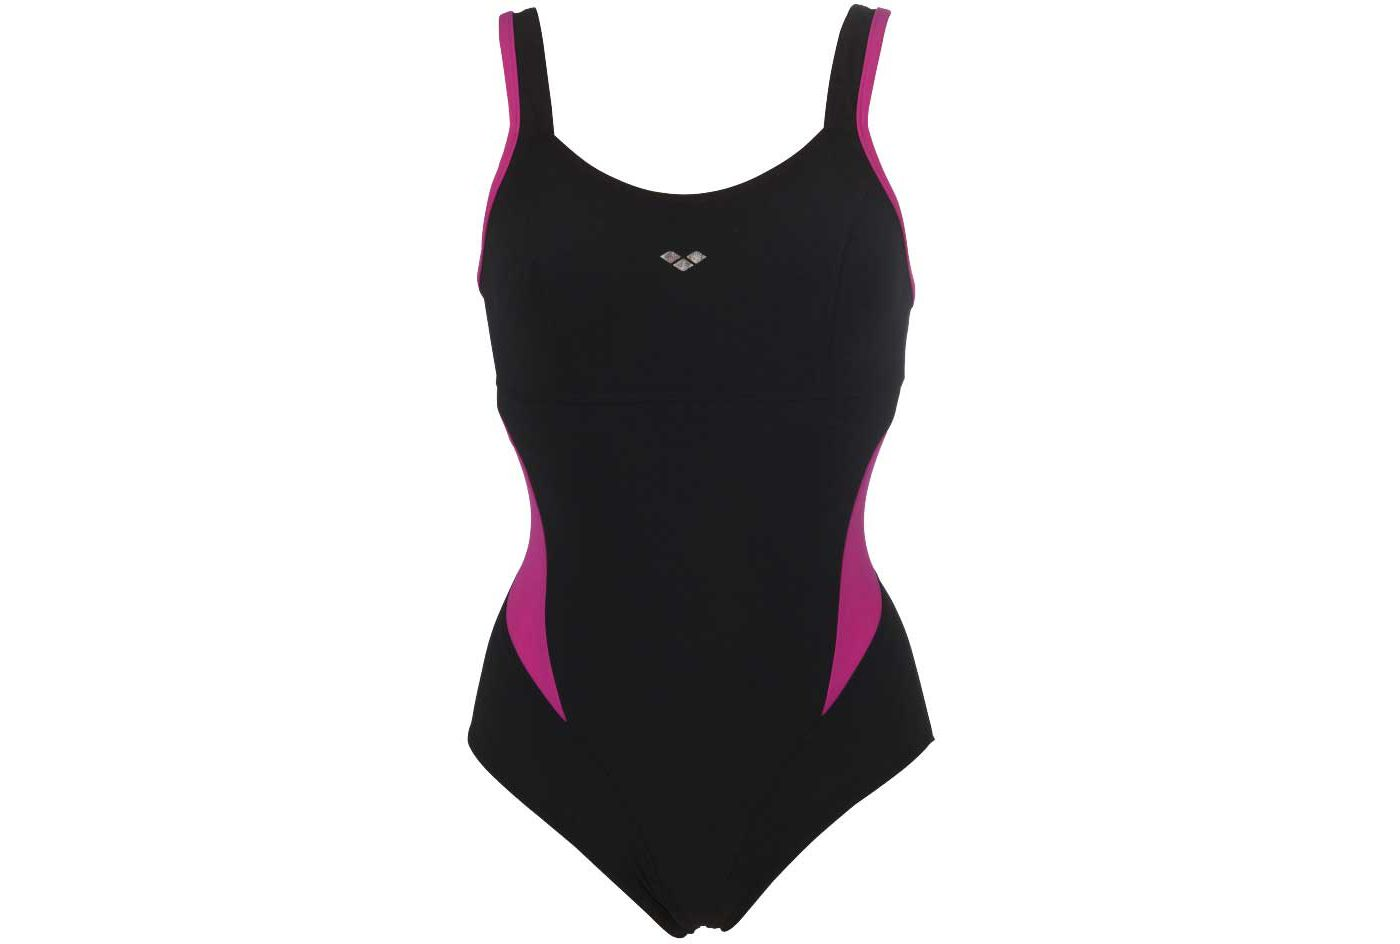 arena Women's BodyLift Maximurax C Cup Shapewear Swimsuit